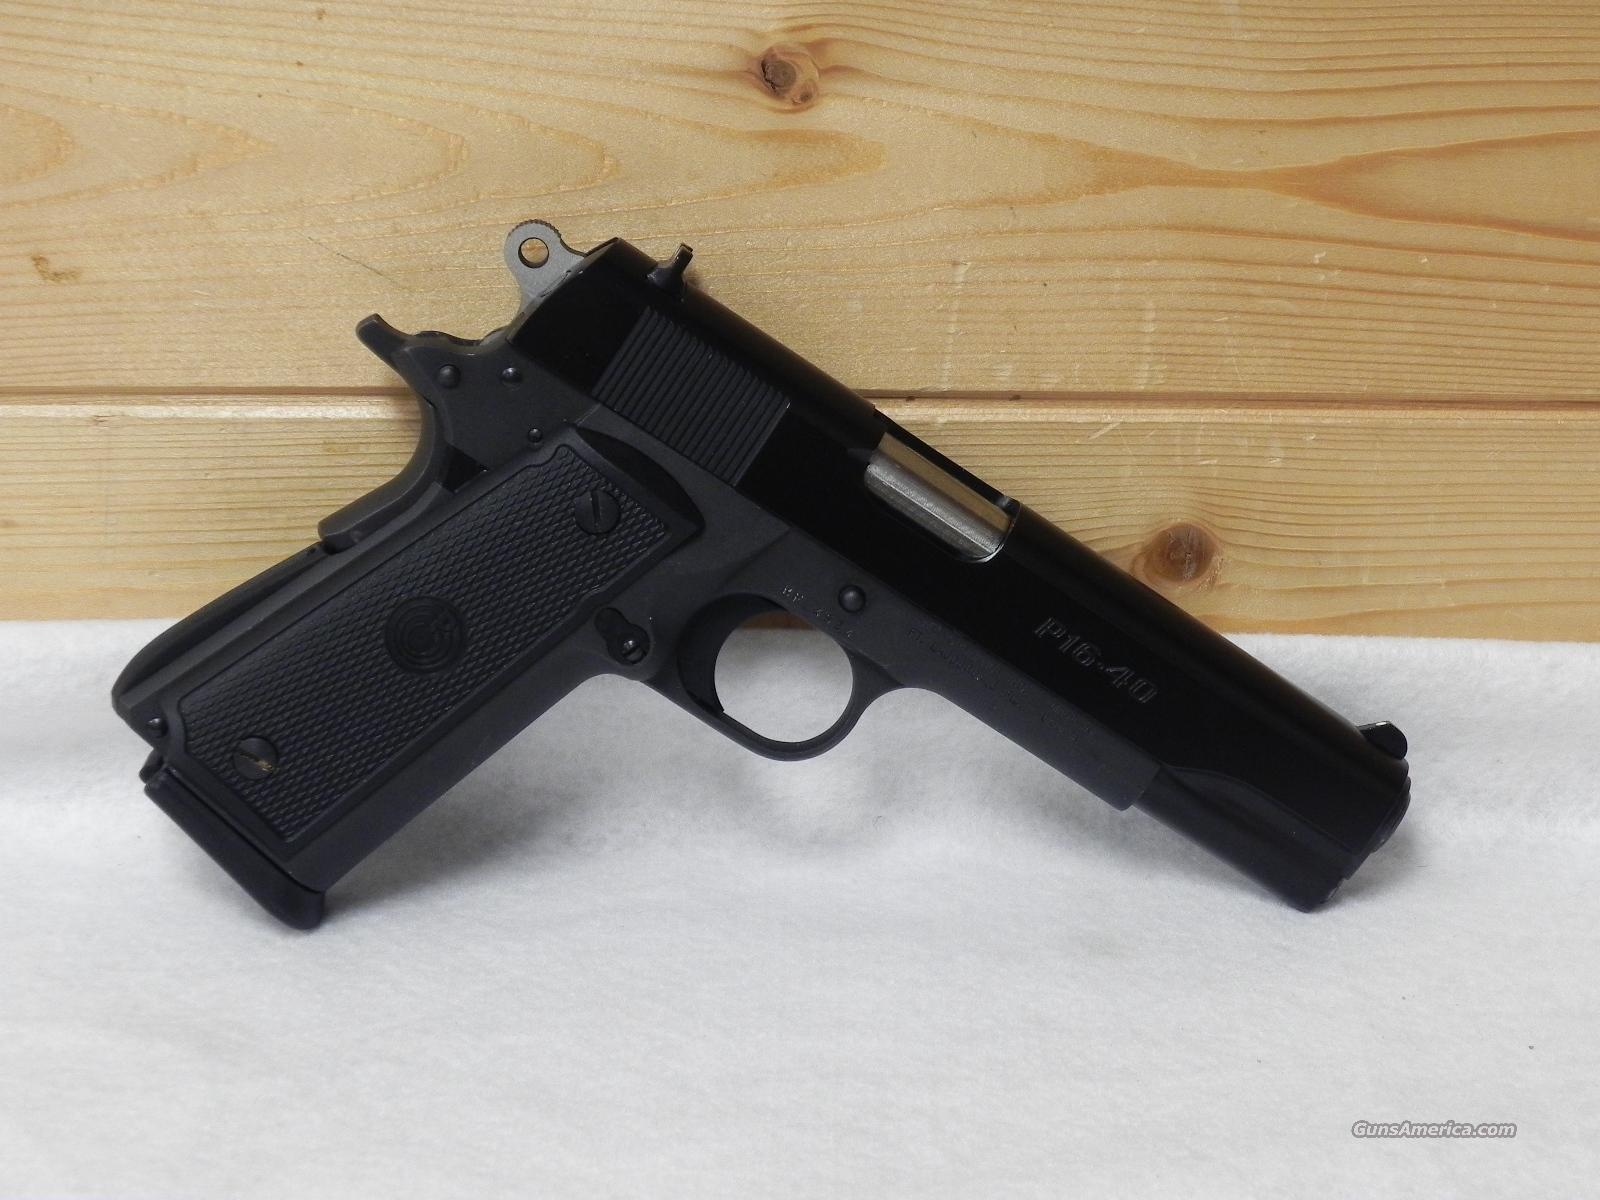 Para-ordnance p-16  40 s&w  Guns > Pistols > Para Ordnance Pistols